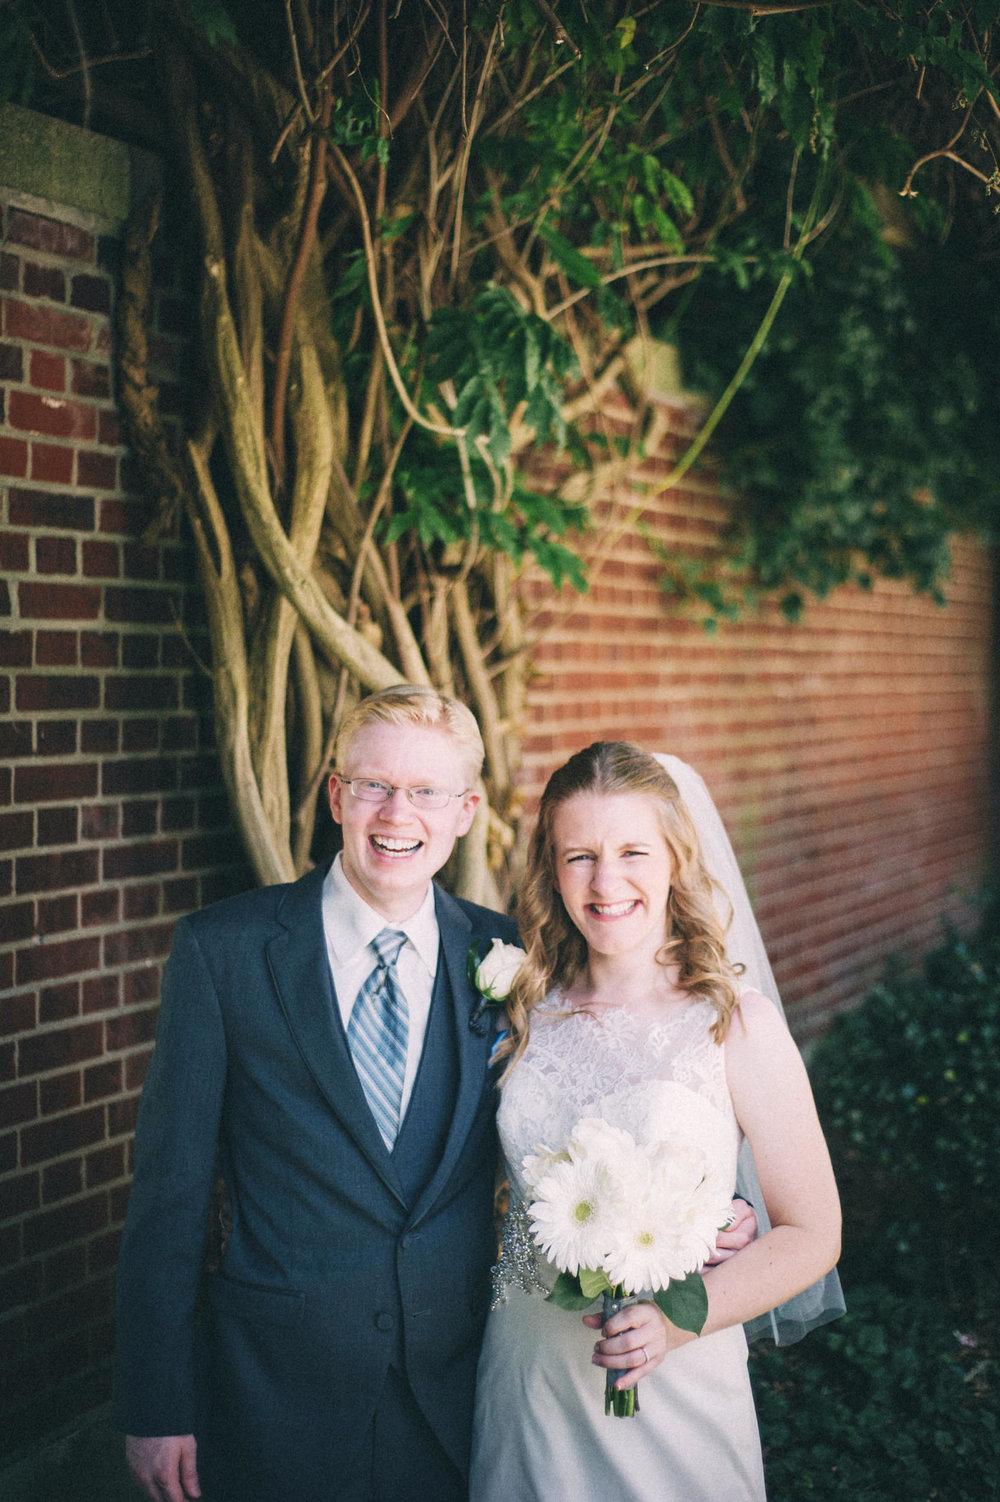 Jenna-Patrick-Garden-Court-Presbyterian-Seminary-Wedding-Louisville-Kentucky-Sarah-Katherine-Davis-Photography-50.jpg